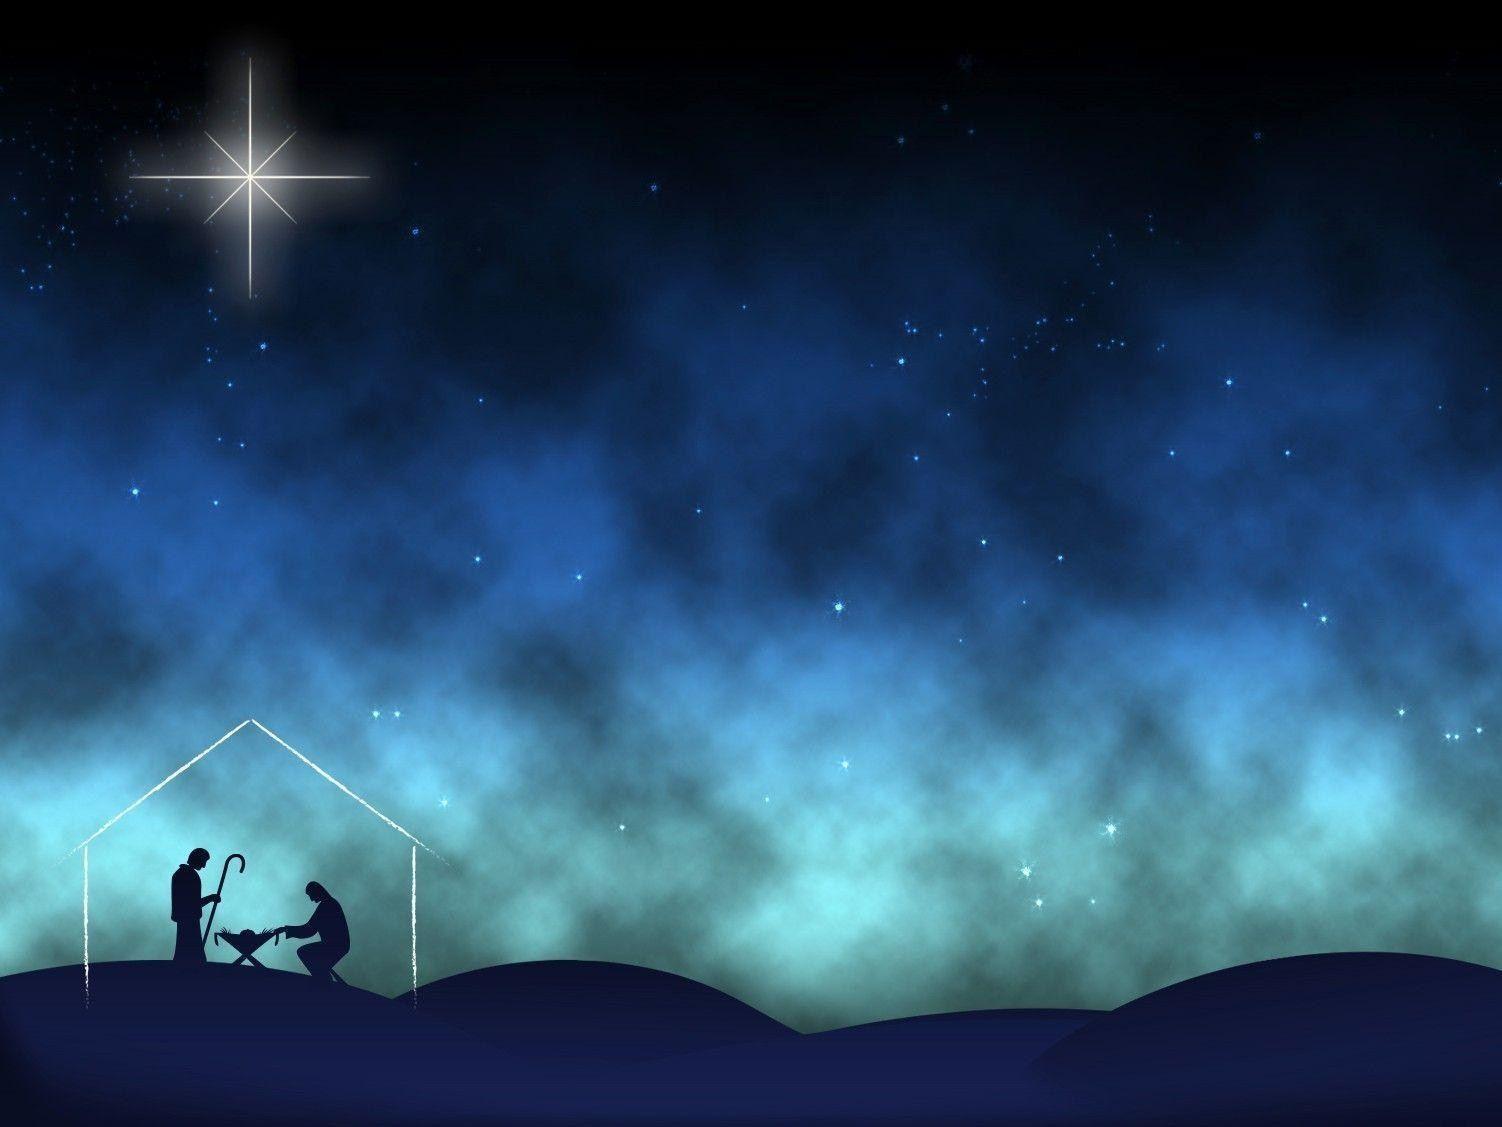 Christmas Nativity Wallpapers Top Free Christmas Nativity